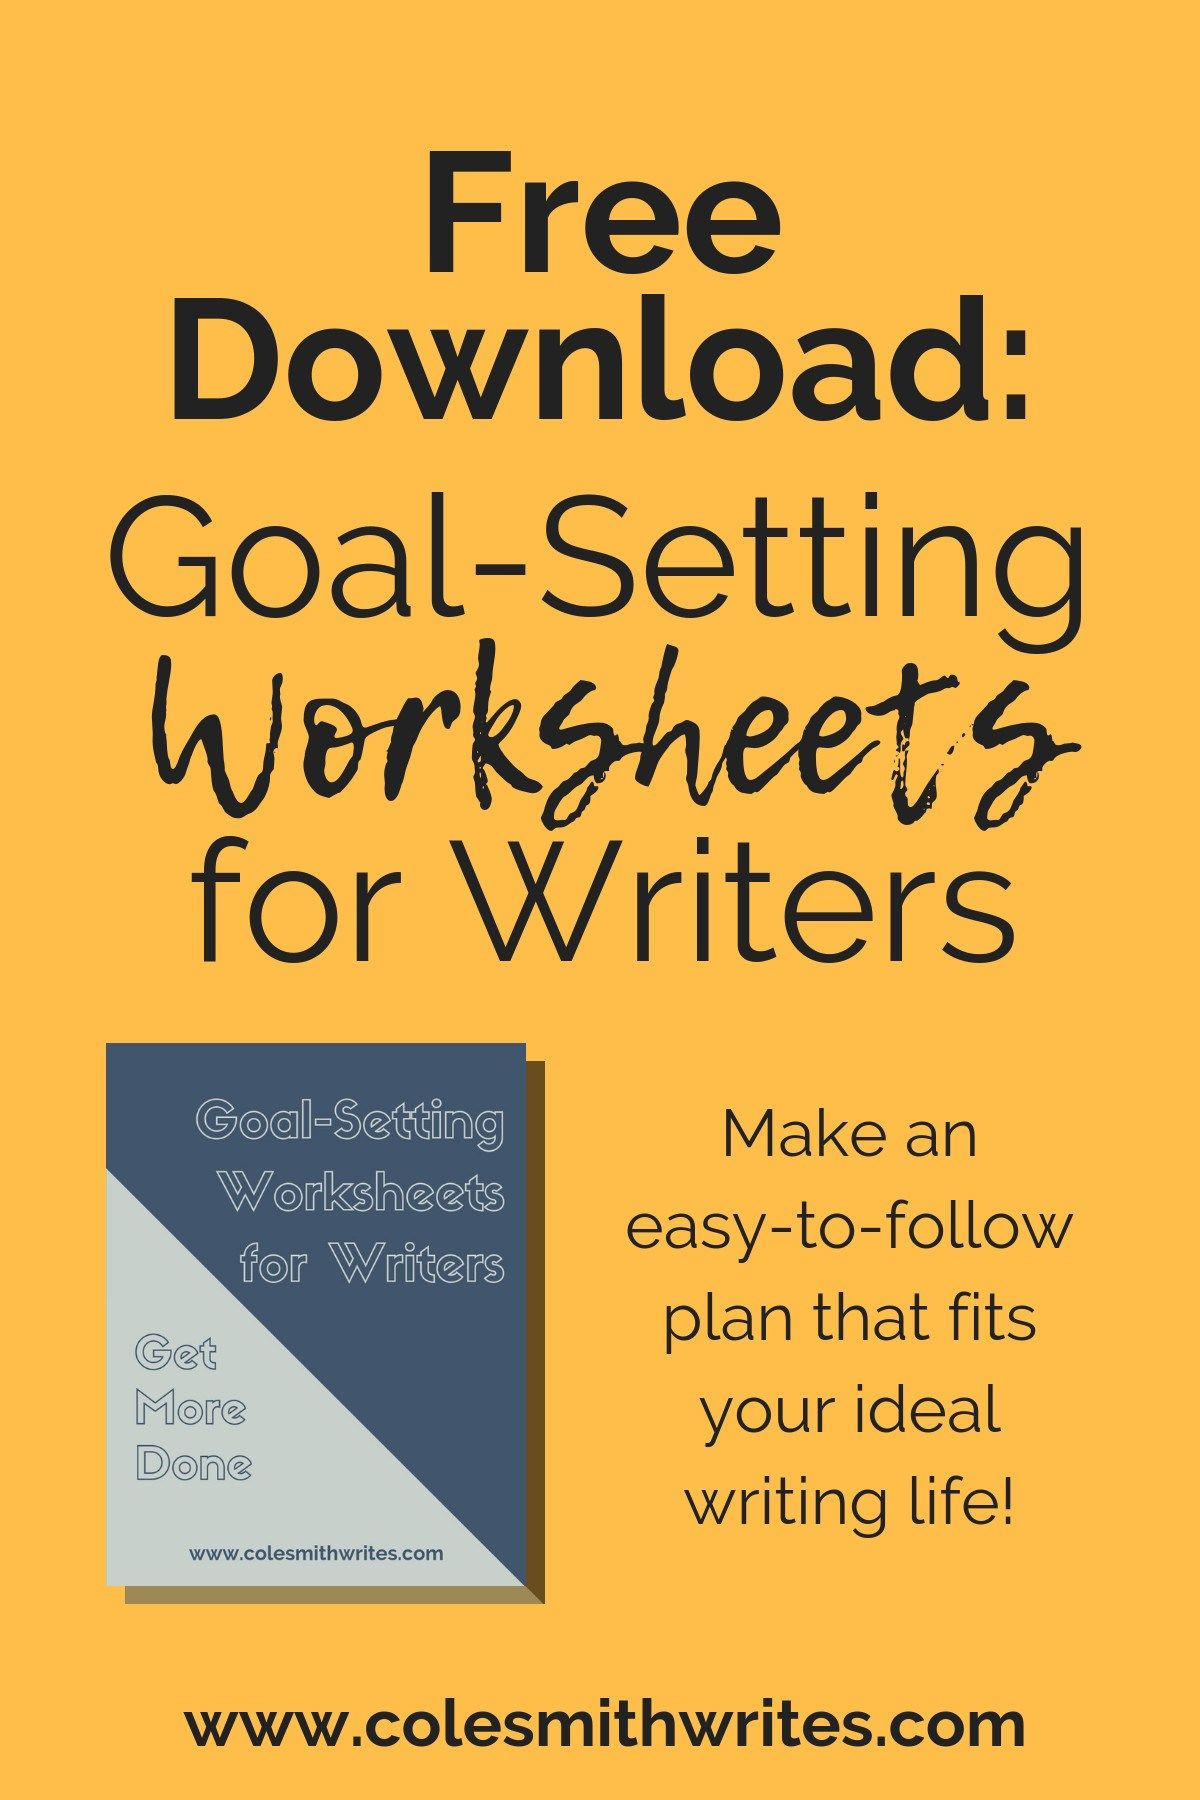 Free Downloadable Goal Setting Worksheets